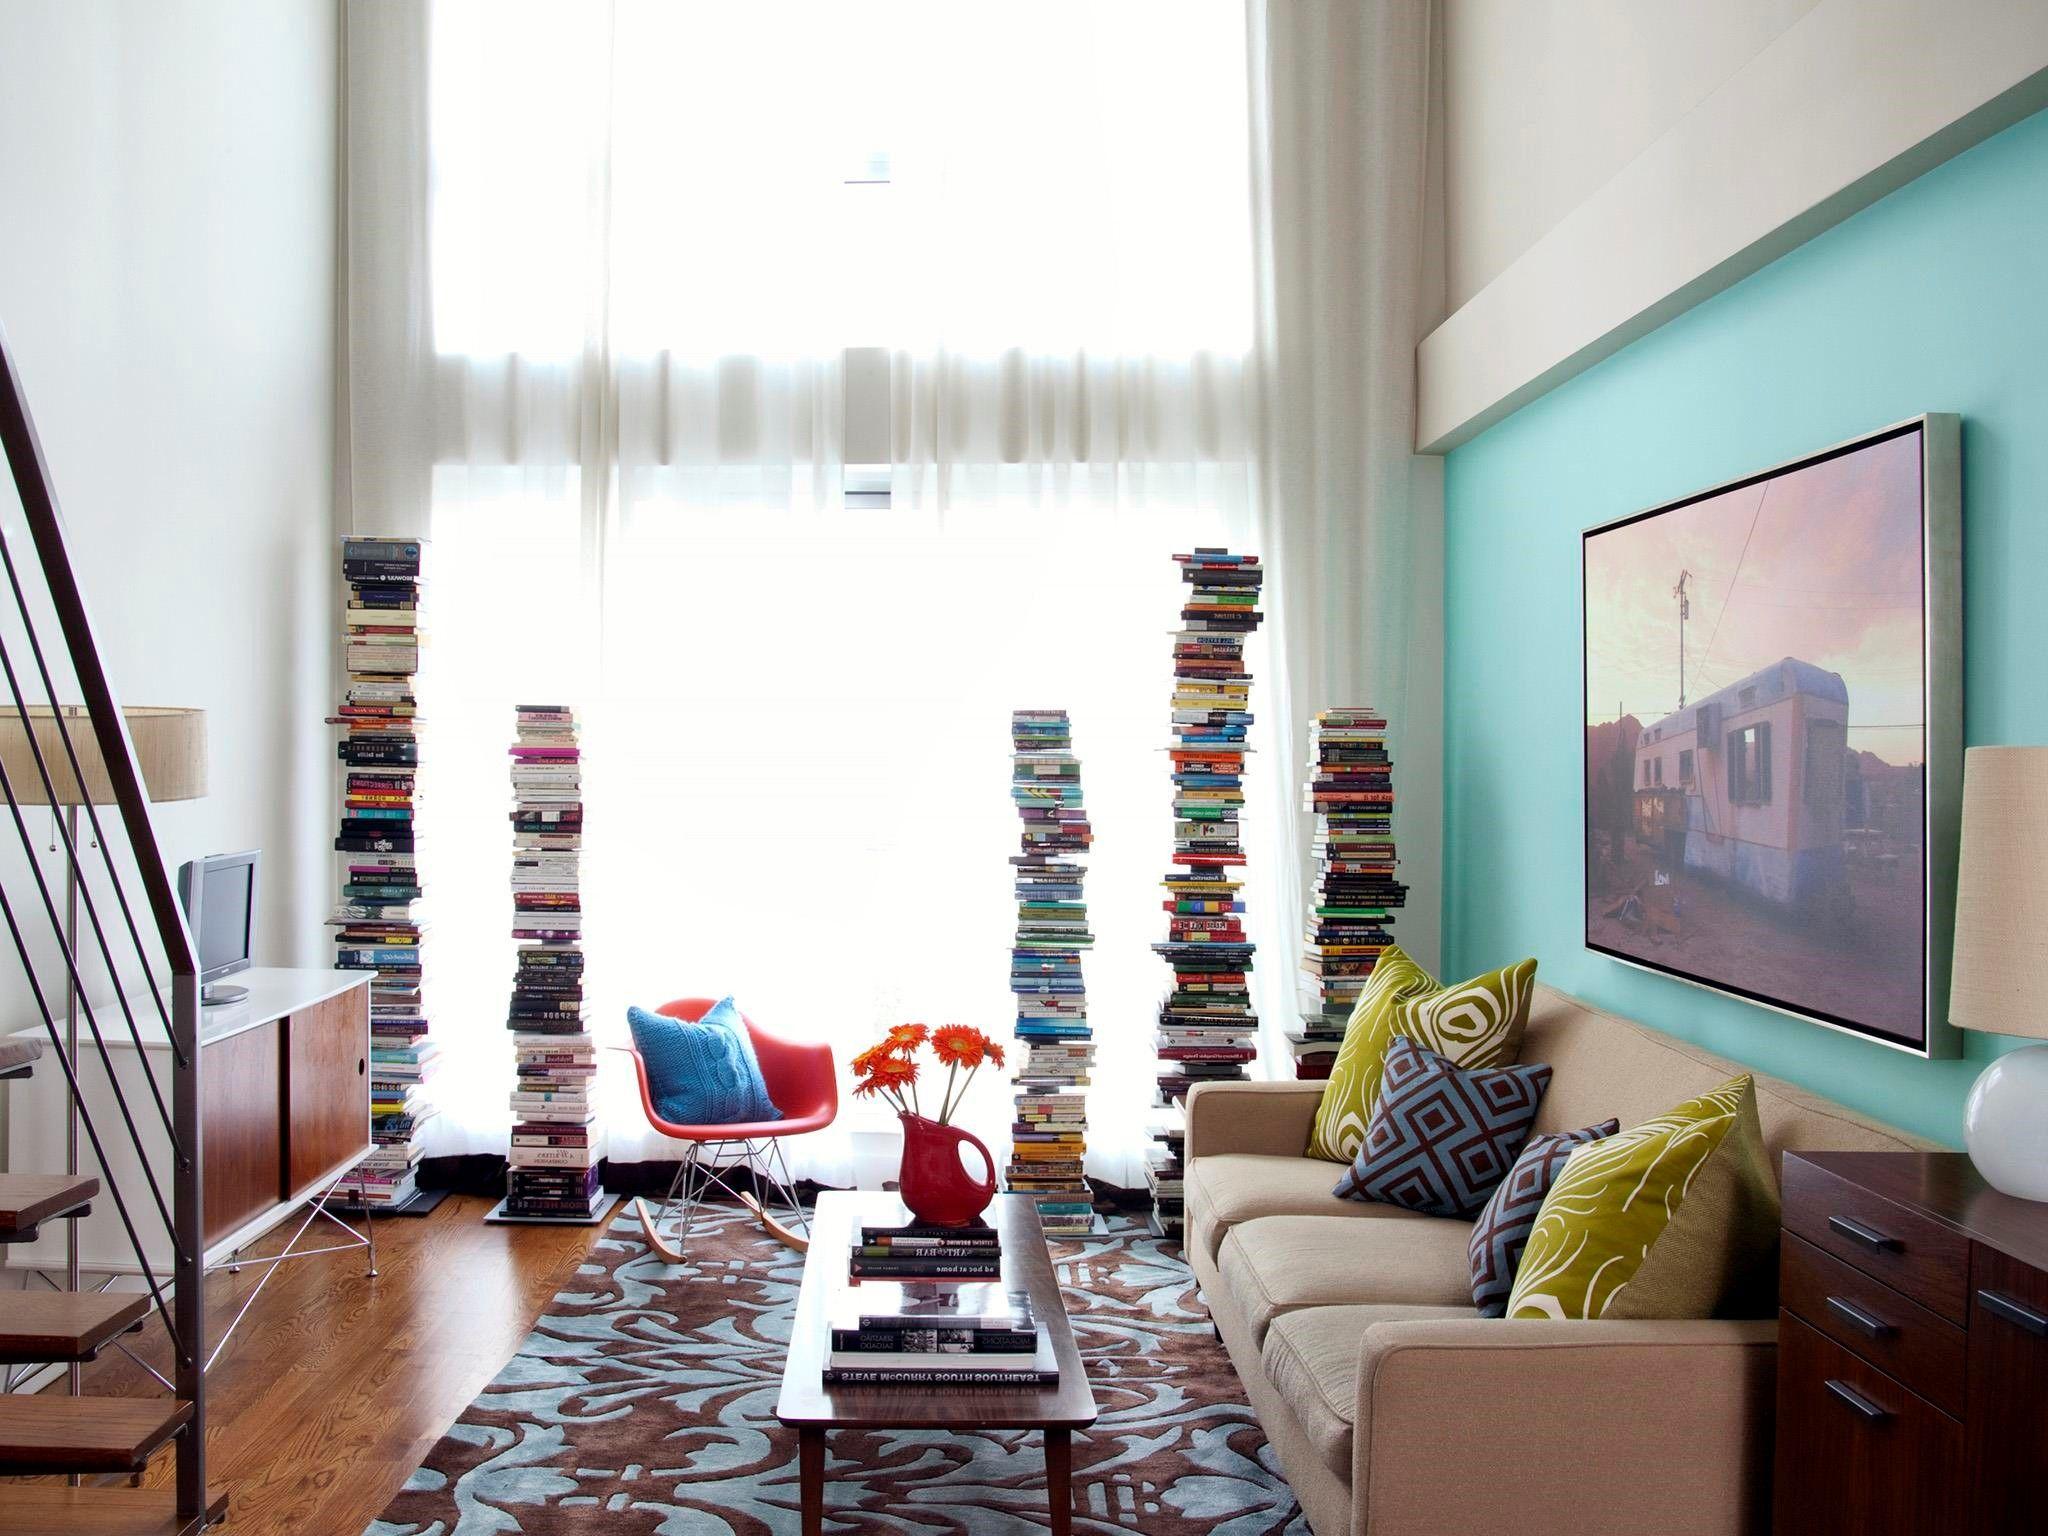 Modern Vintage Home Decor #livingroomideas #luxuryhomes #interiordesign  Modern Design, Luxury Lighting, Part 2